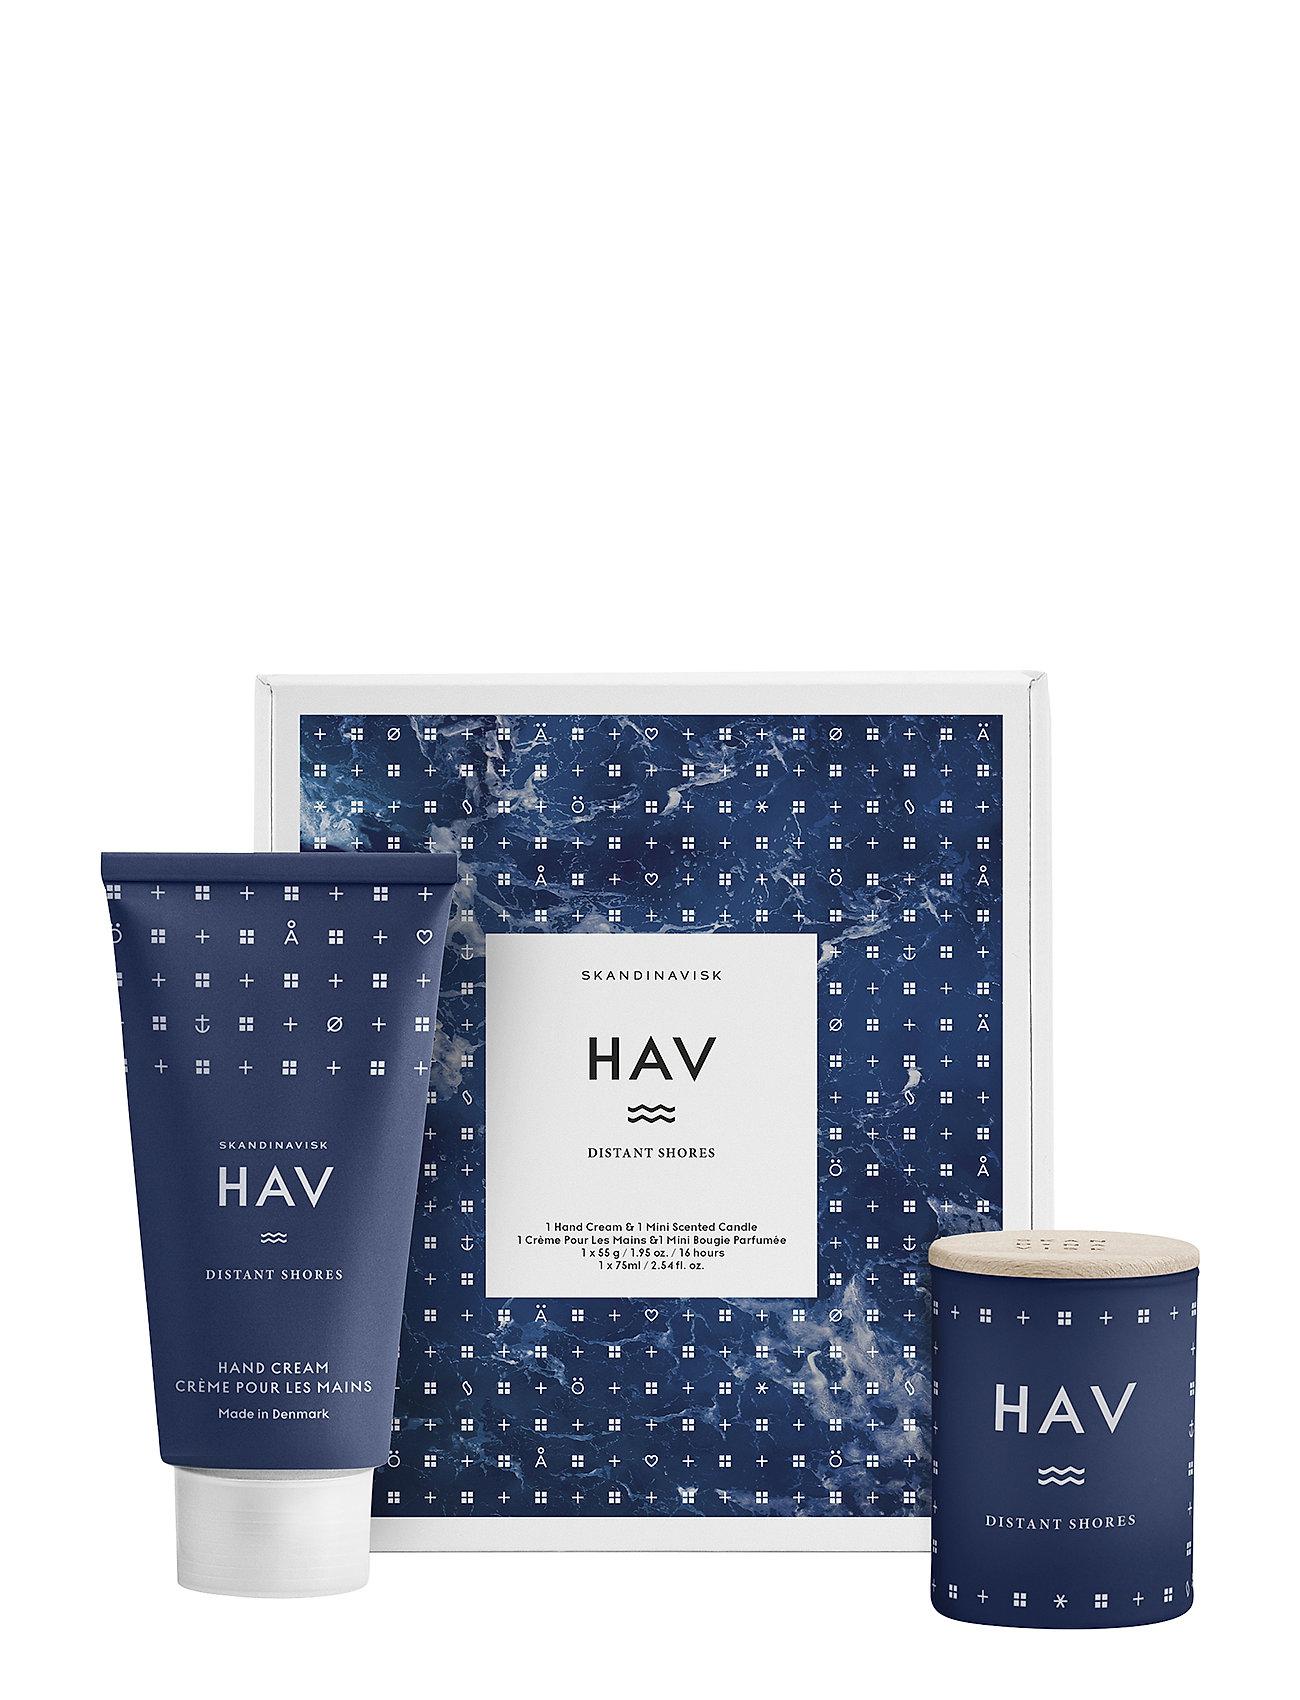 Image of Hav Mini Candle & Handcream Set Gavesæt Beauty Nude Skandinavisk (3237677157)